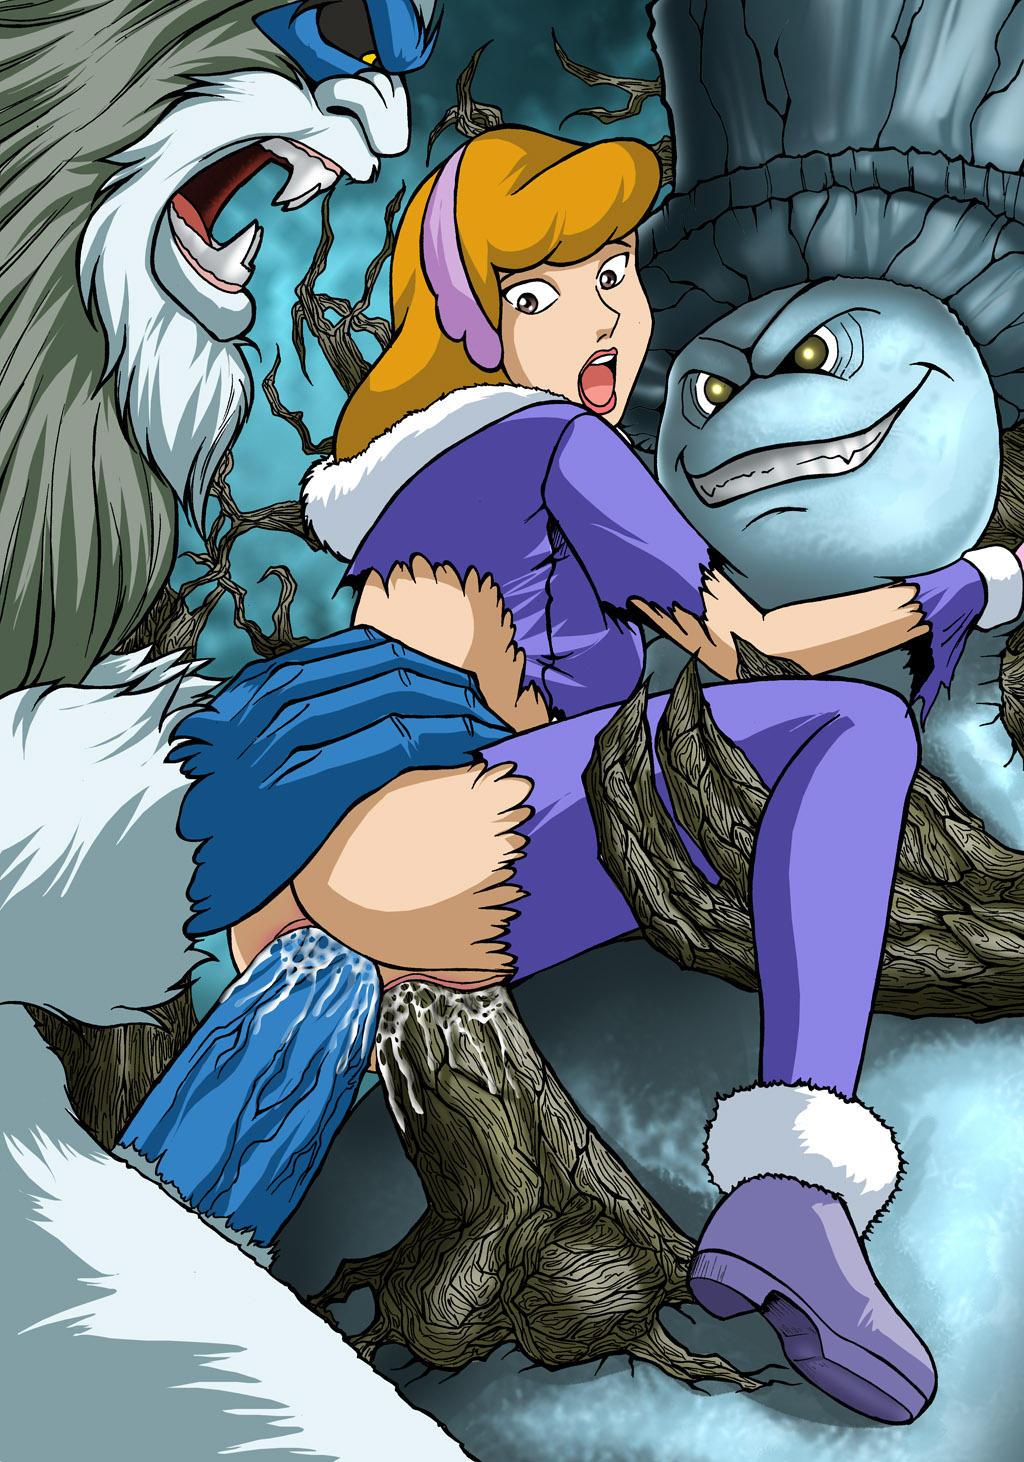 Tooon monster dragon sex woman erotic scenes